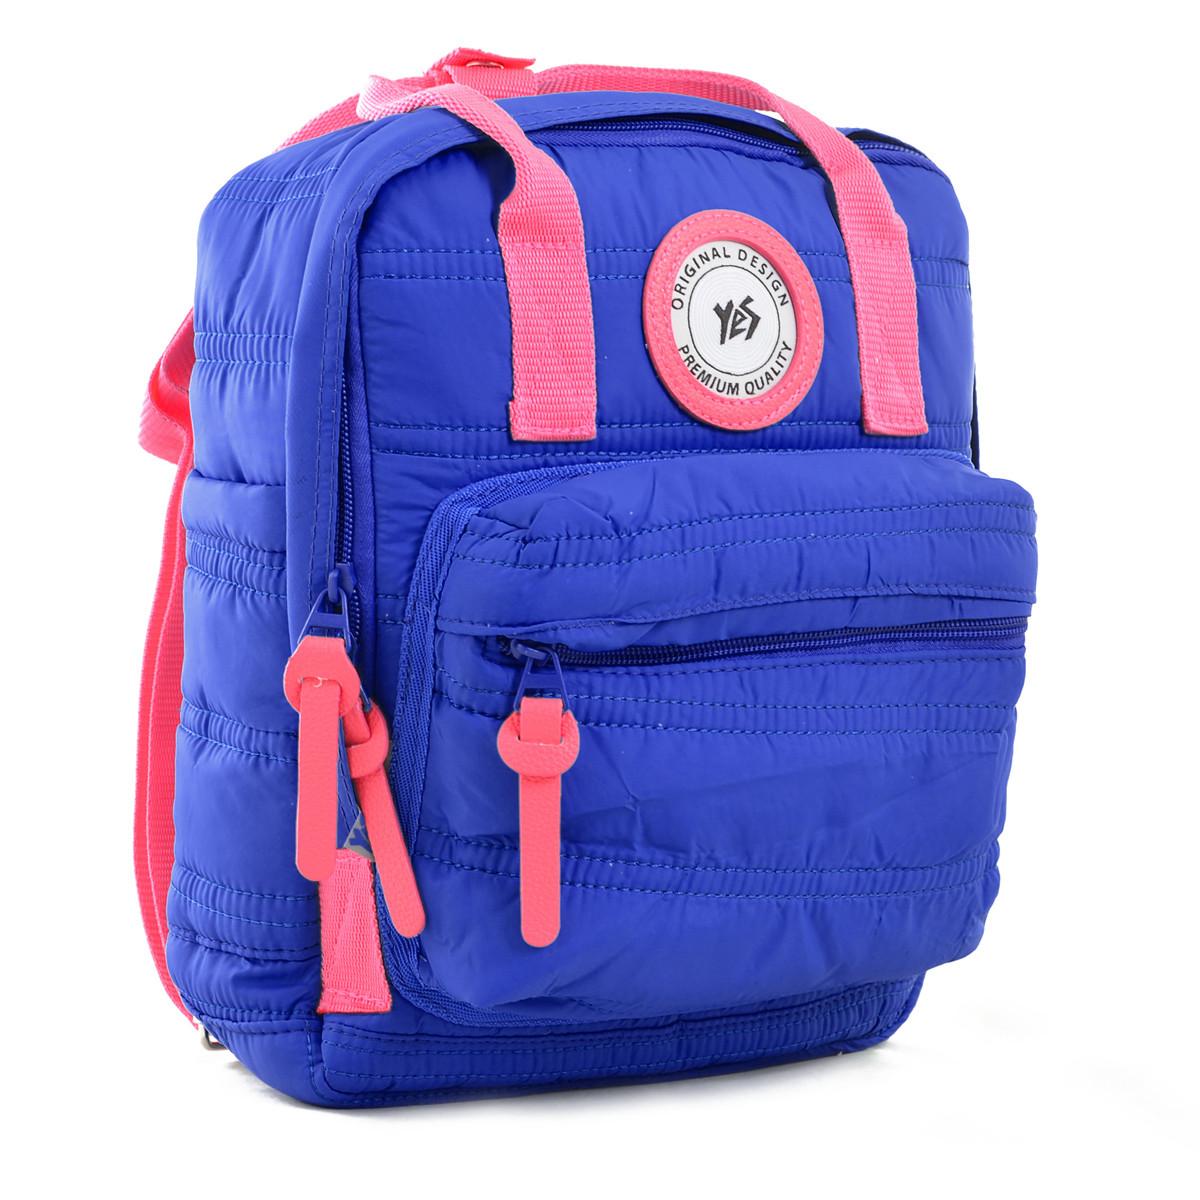 Рюкзак молодежный ST-27 Midnight blue, 29*23*10